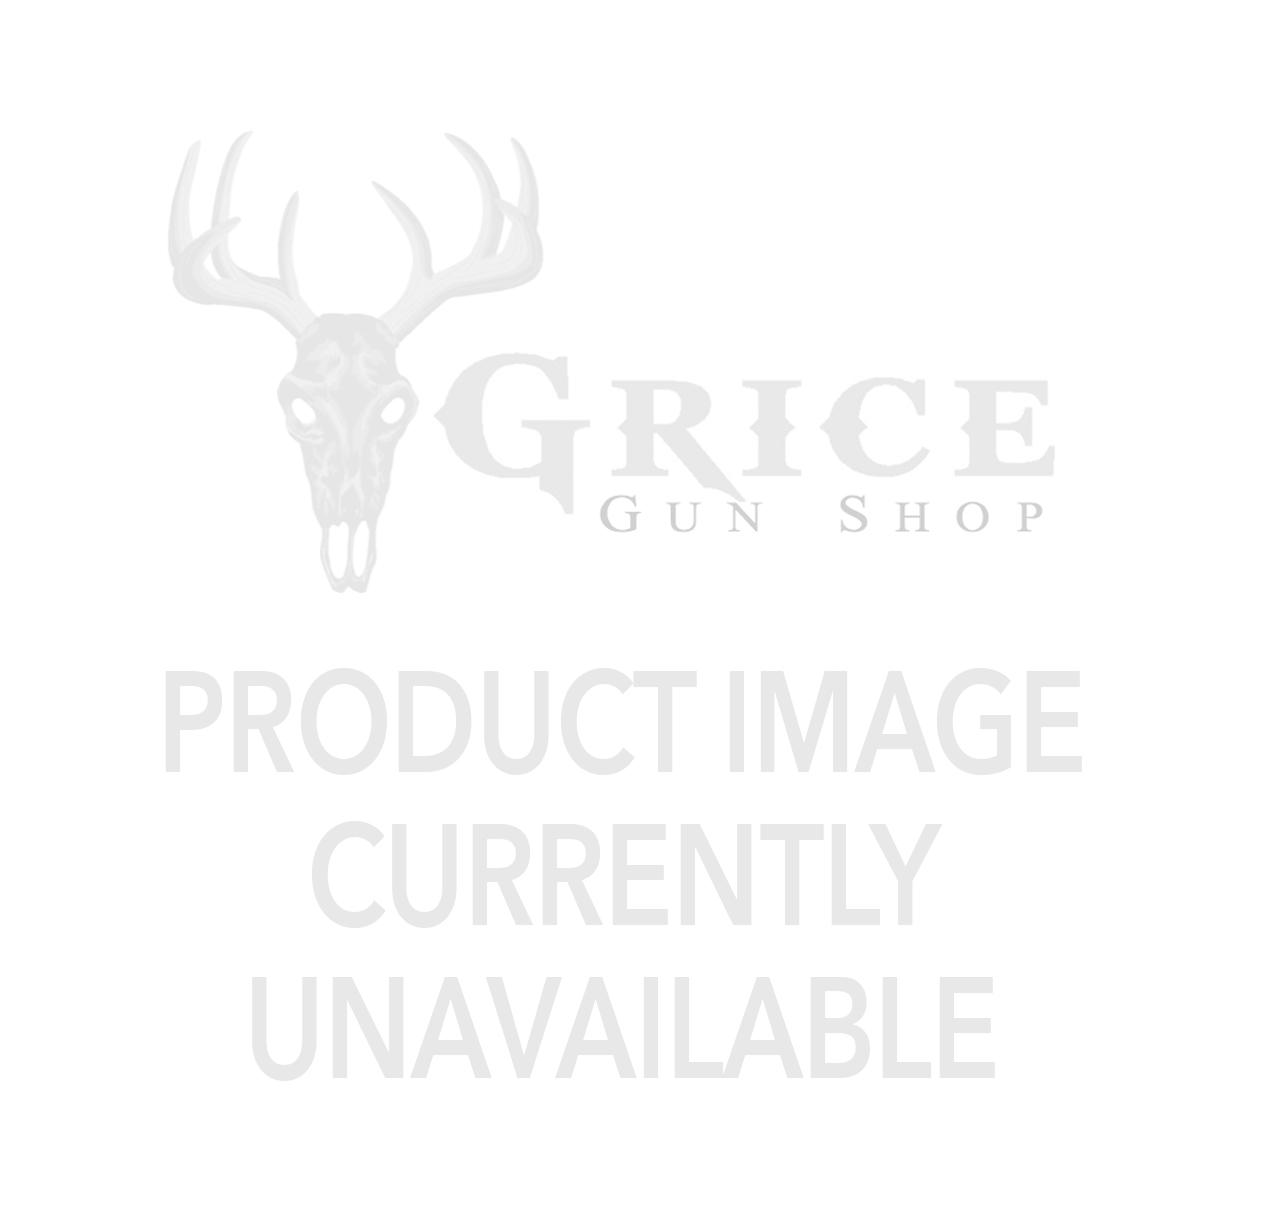 GSM - 14MP G45NG Pro Leaf Camo